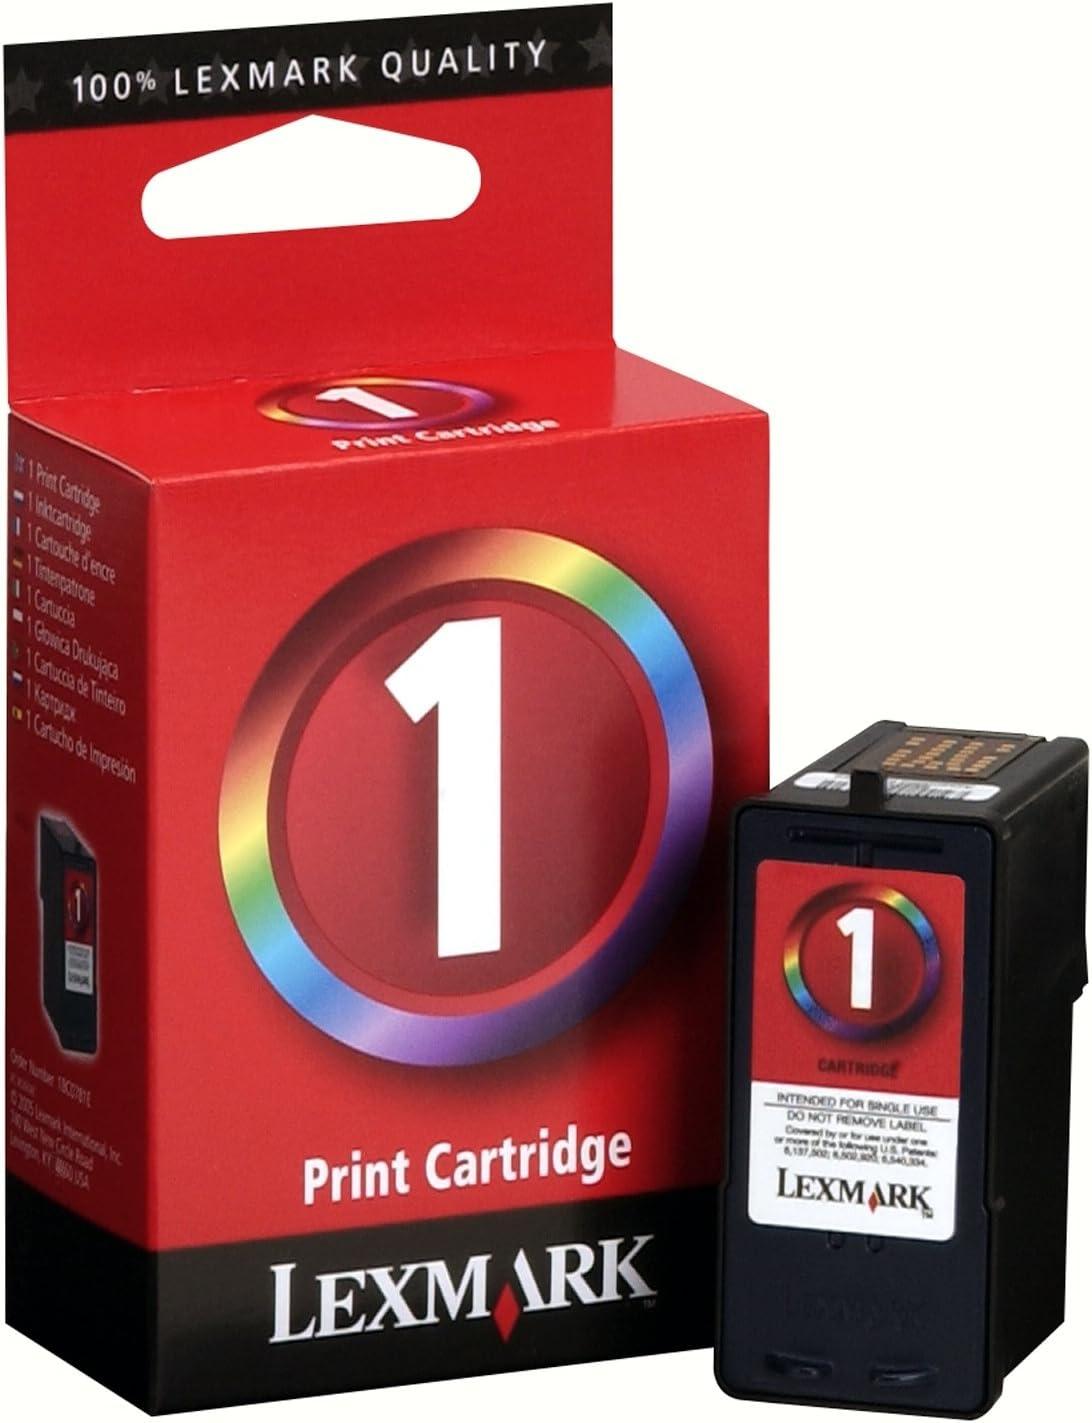 Lexmark 18C0781 Inkjet Ink/Print Cartridge